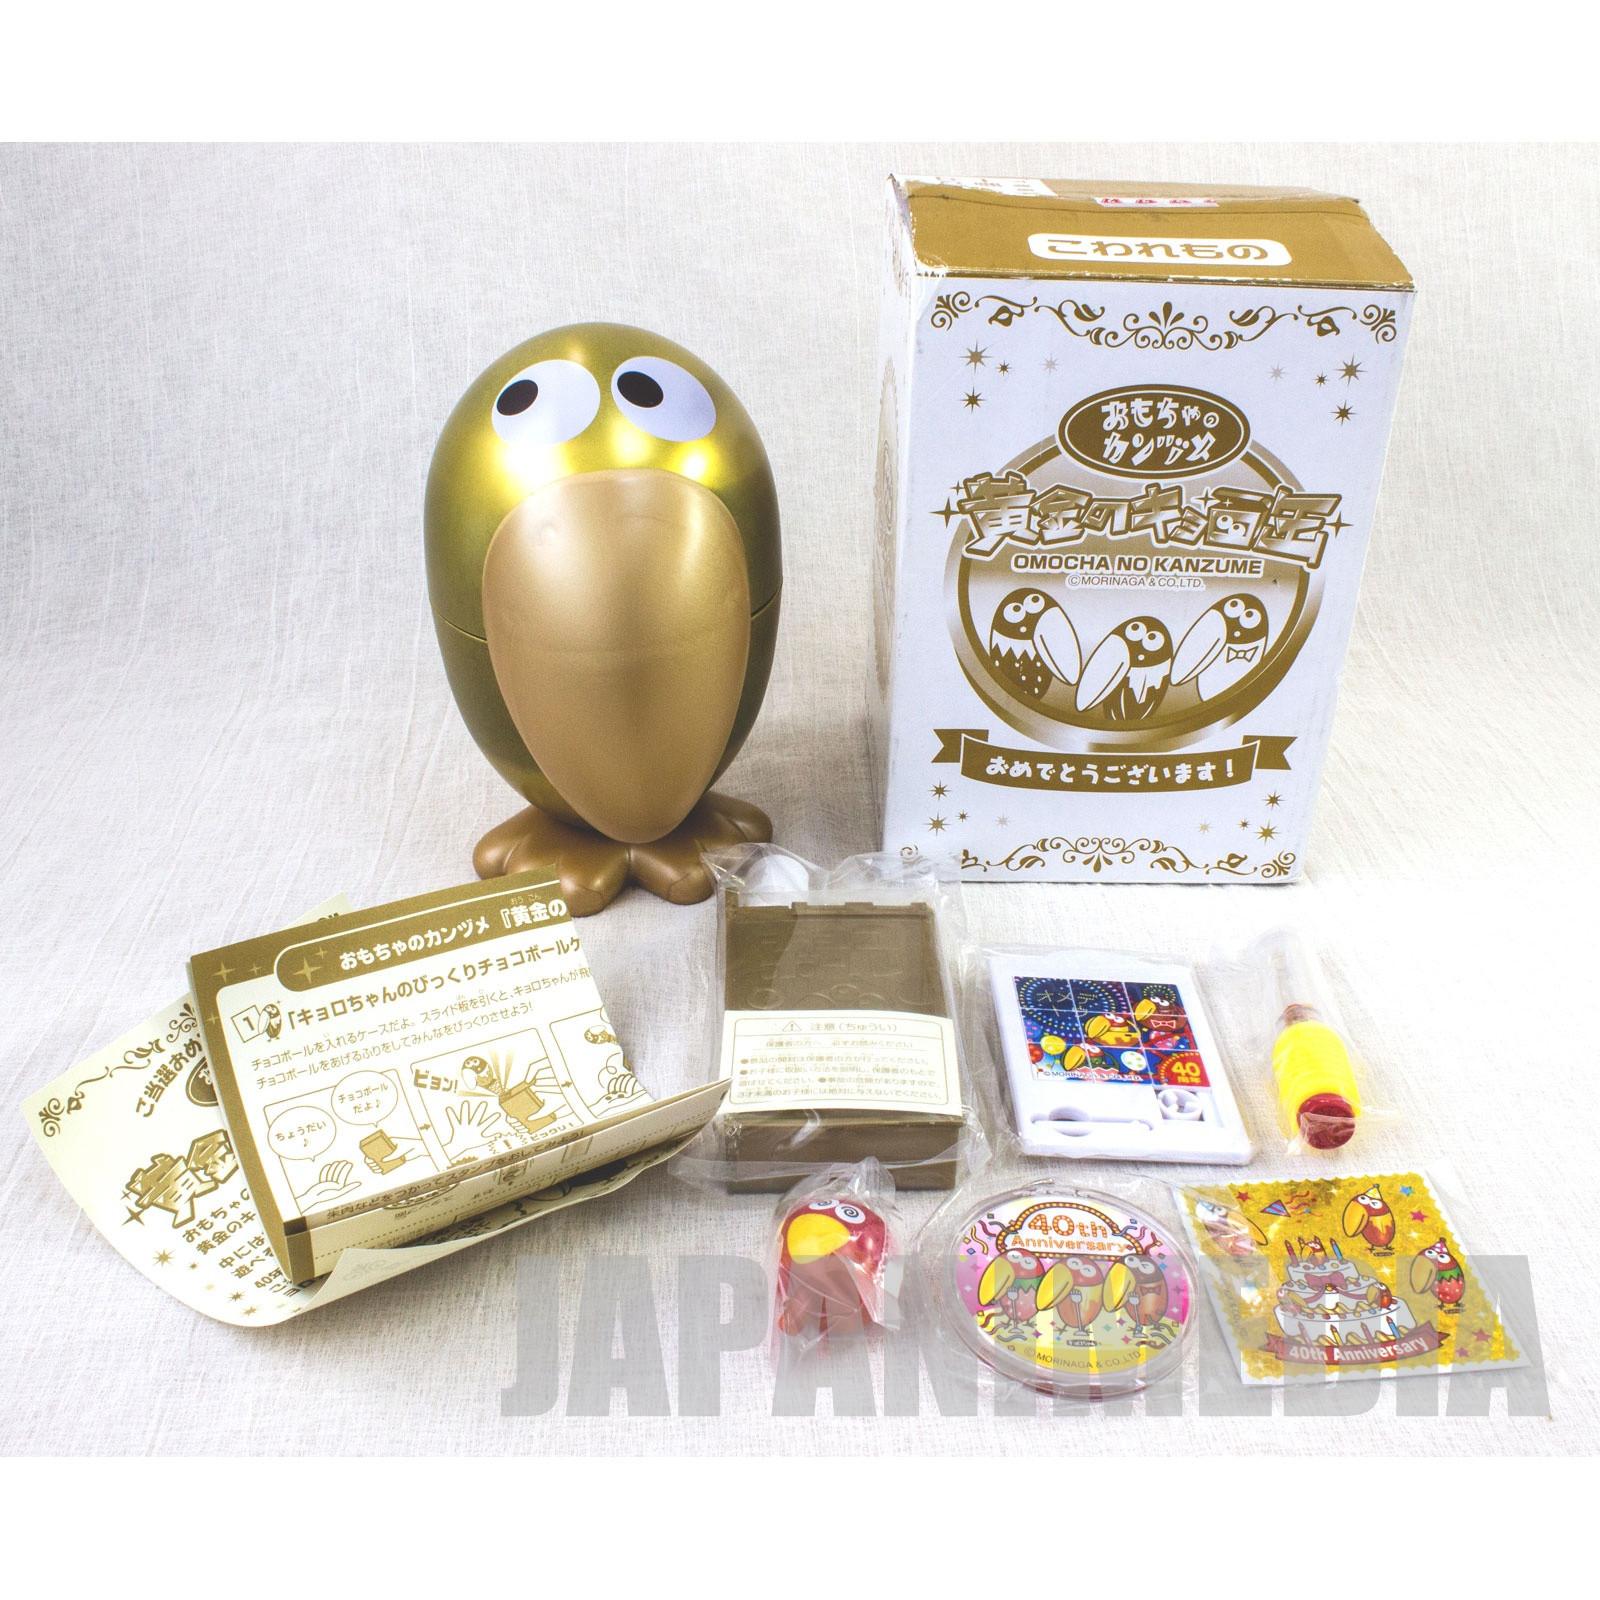 Kyoro-Chan Omocha no Kanzume Toy Can case (Golden ver.) JAPAN ANIME MANGA